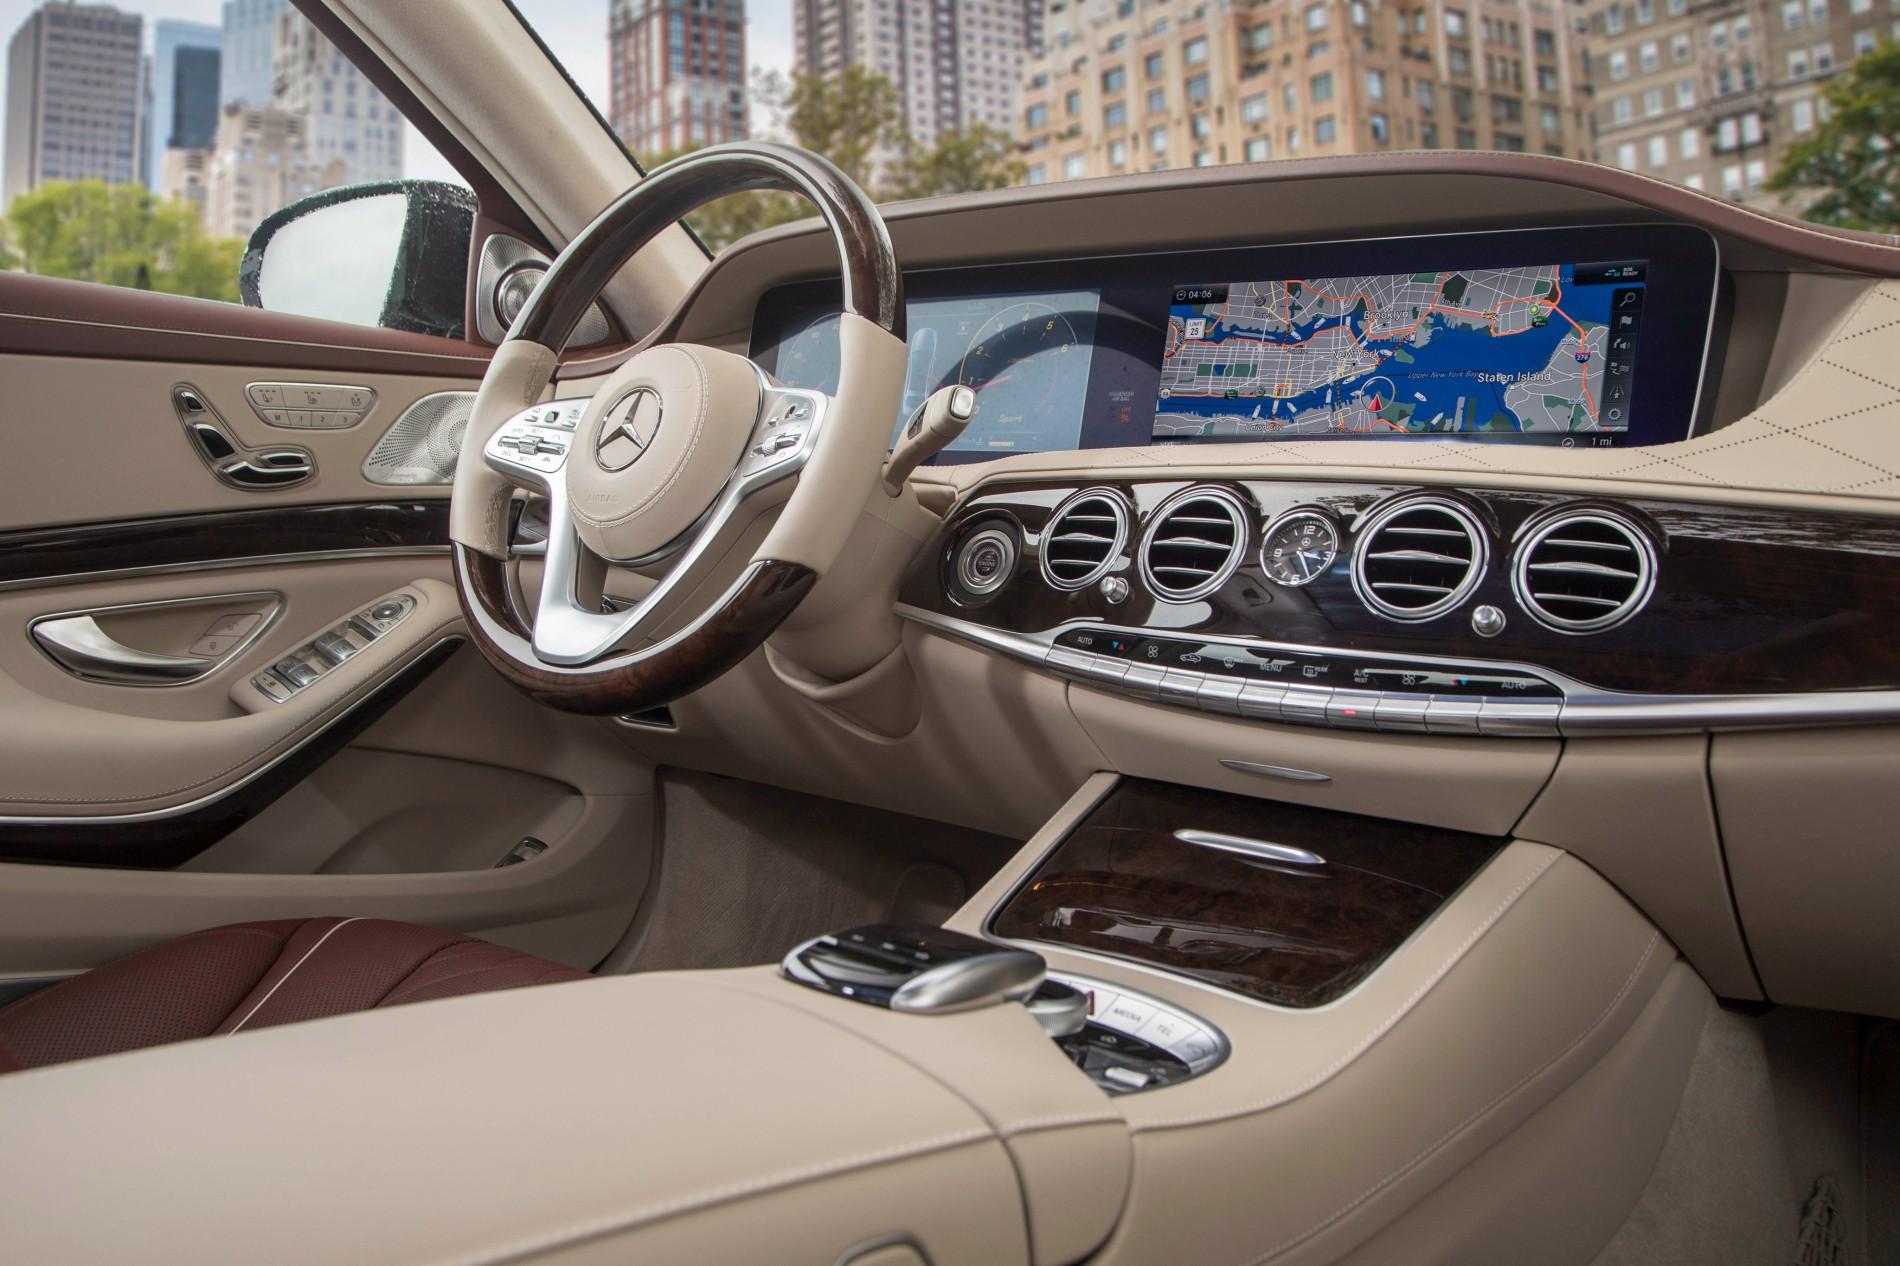 Mercedes-Benz S-Class - Mercedes-Benz S-Class